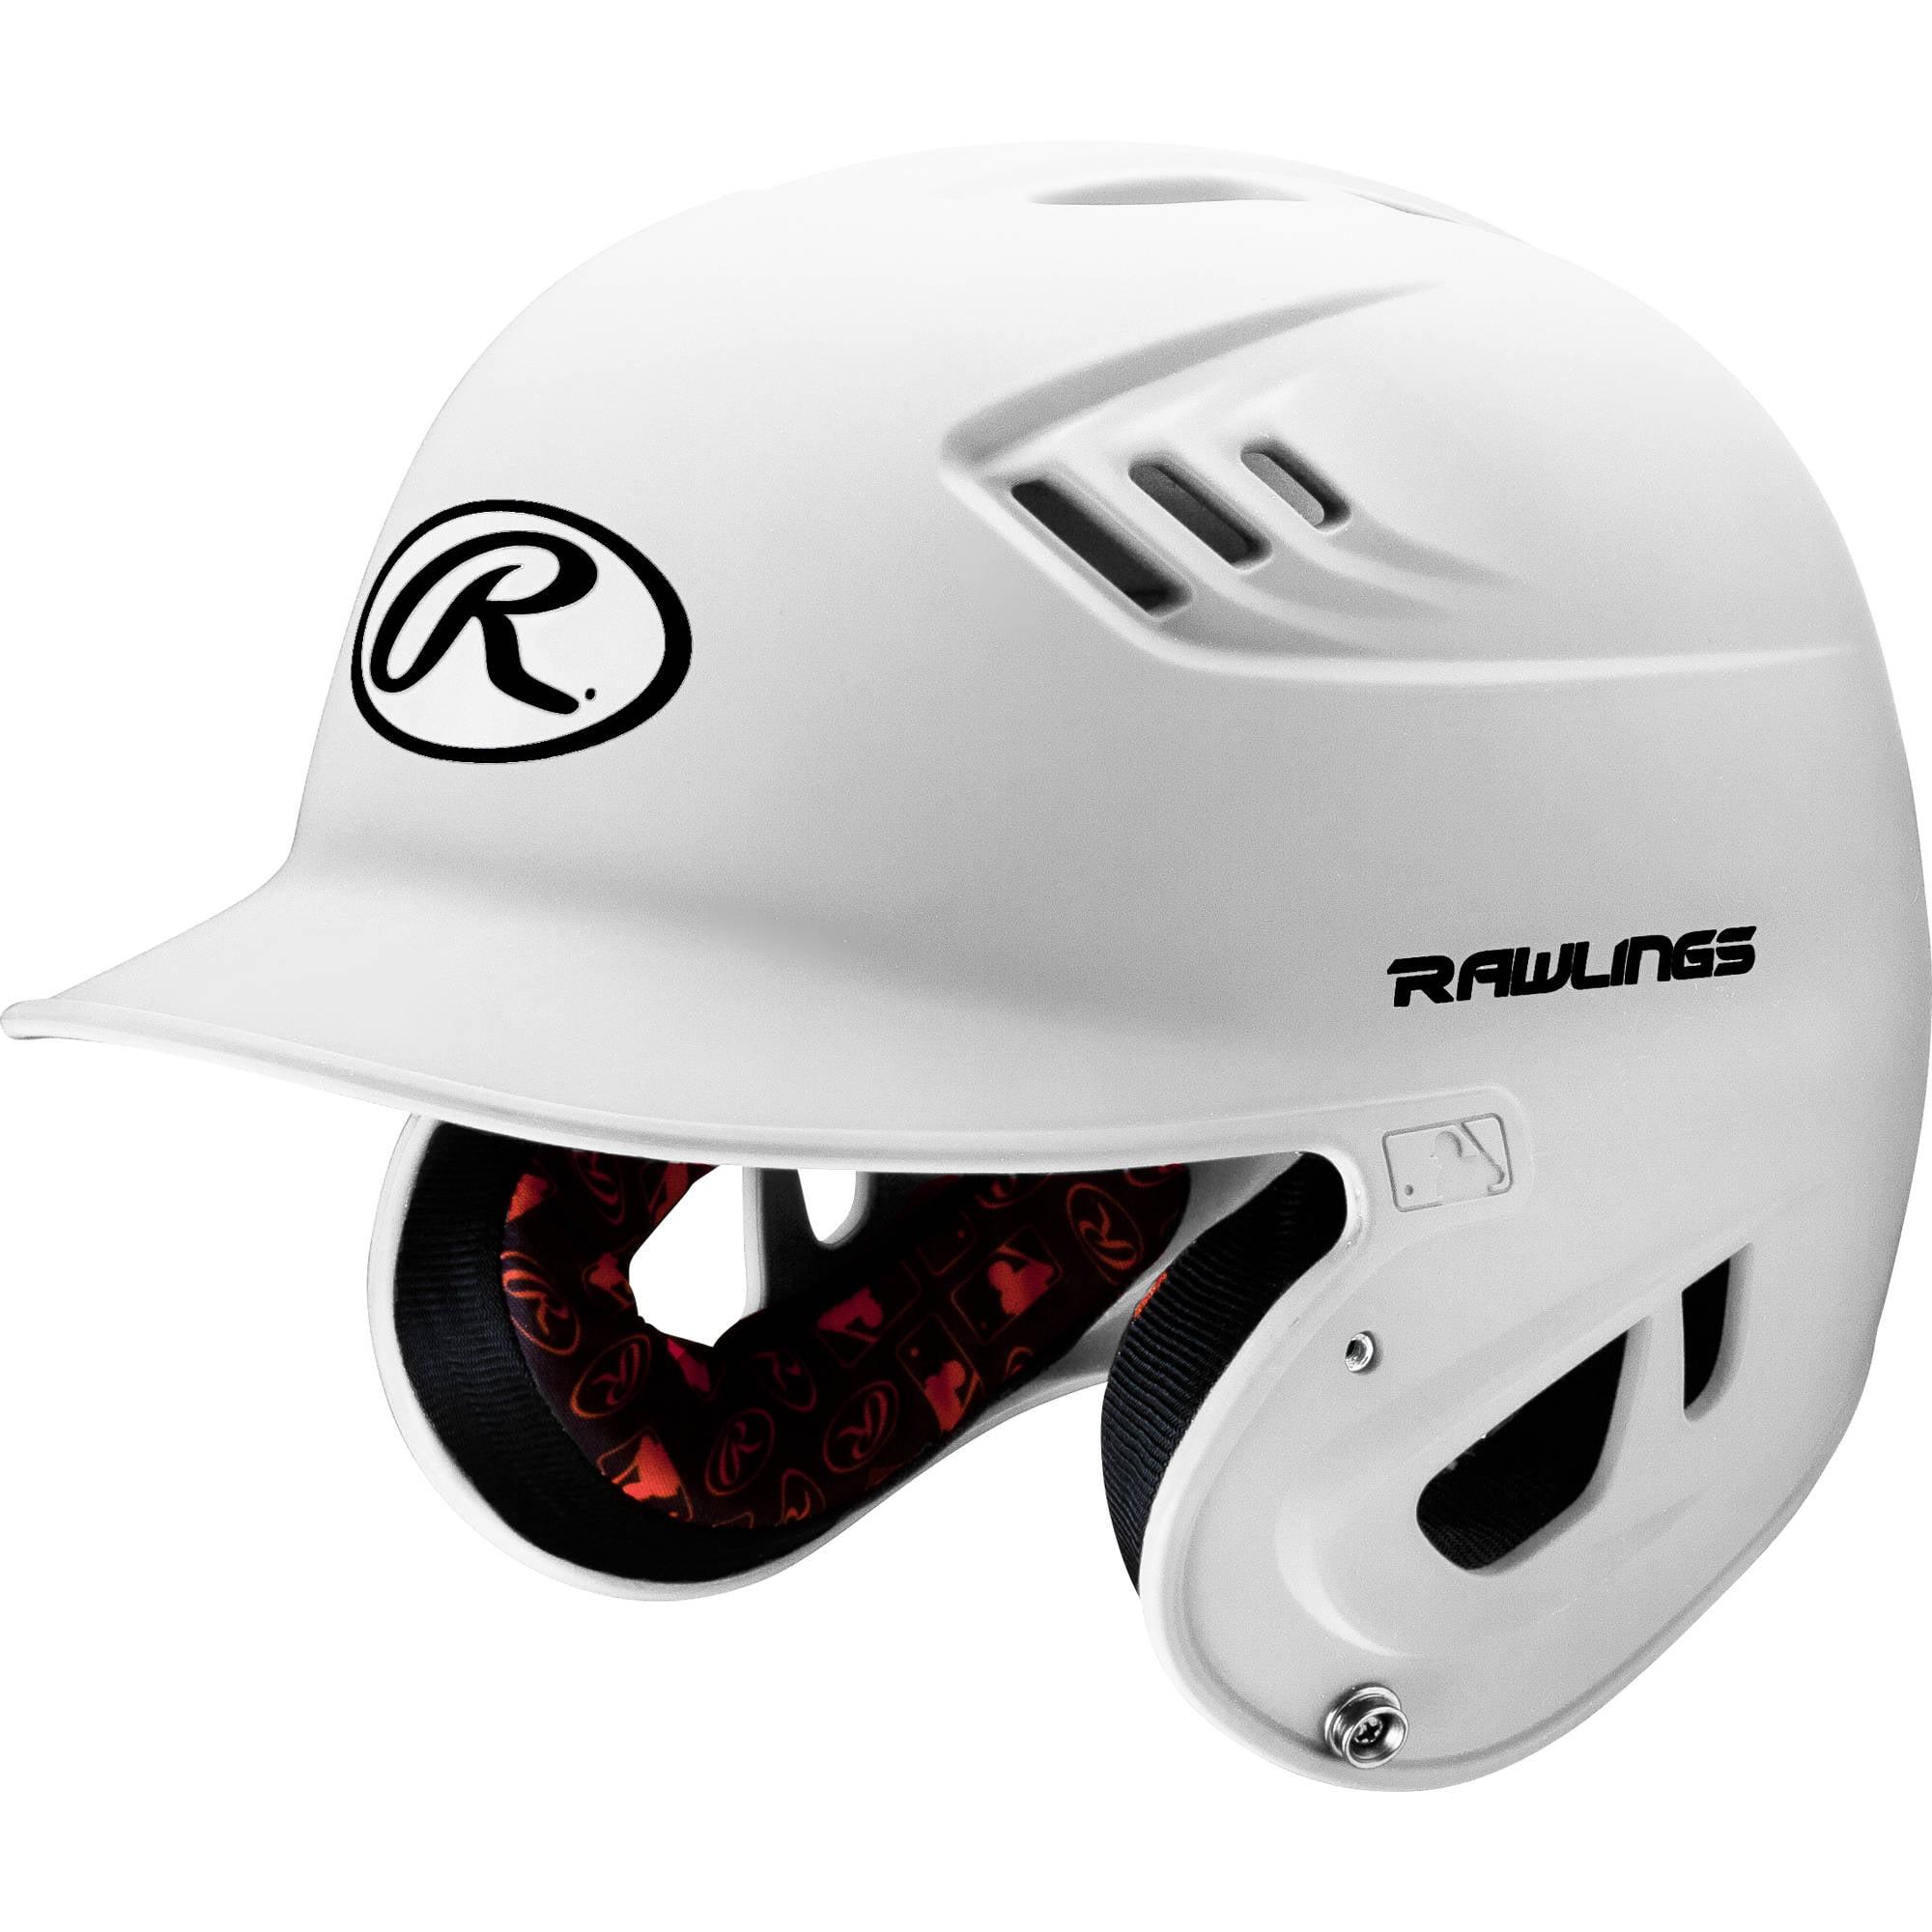 Rawlings Senior R16 Series Matte Helmet, Black